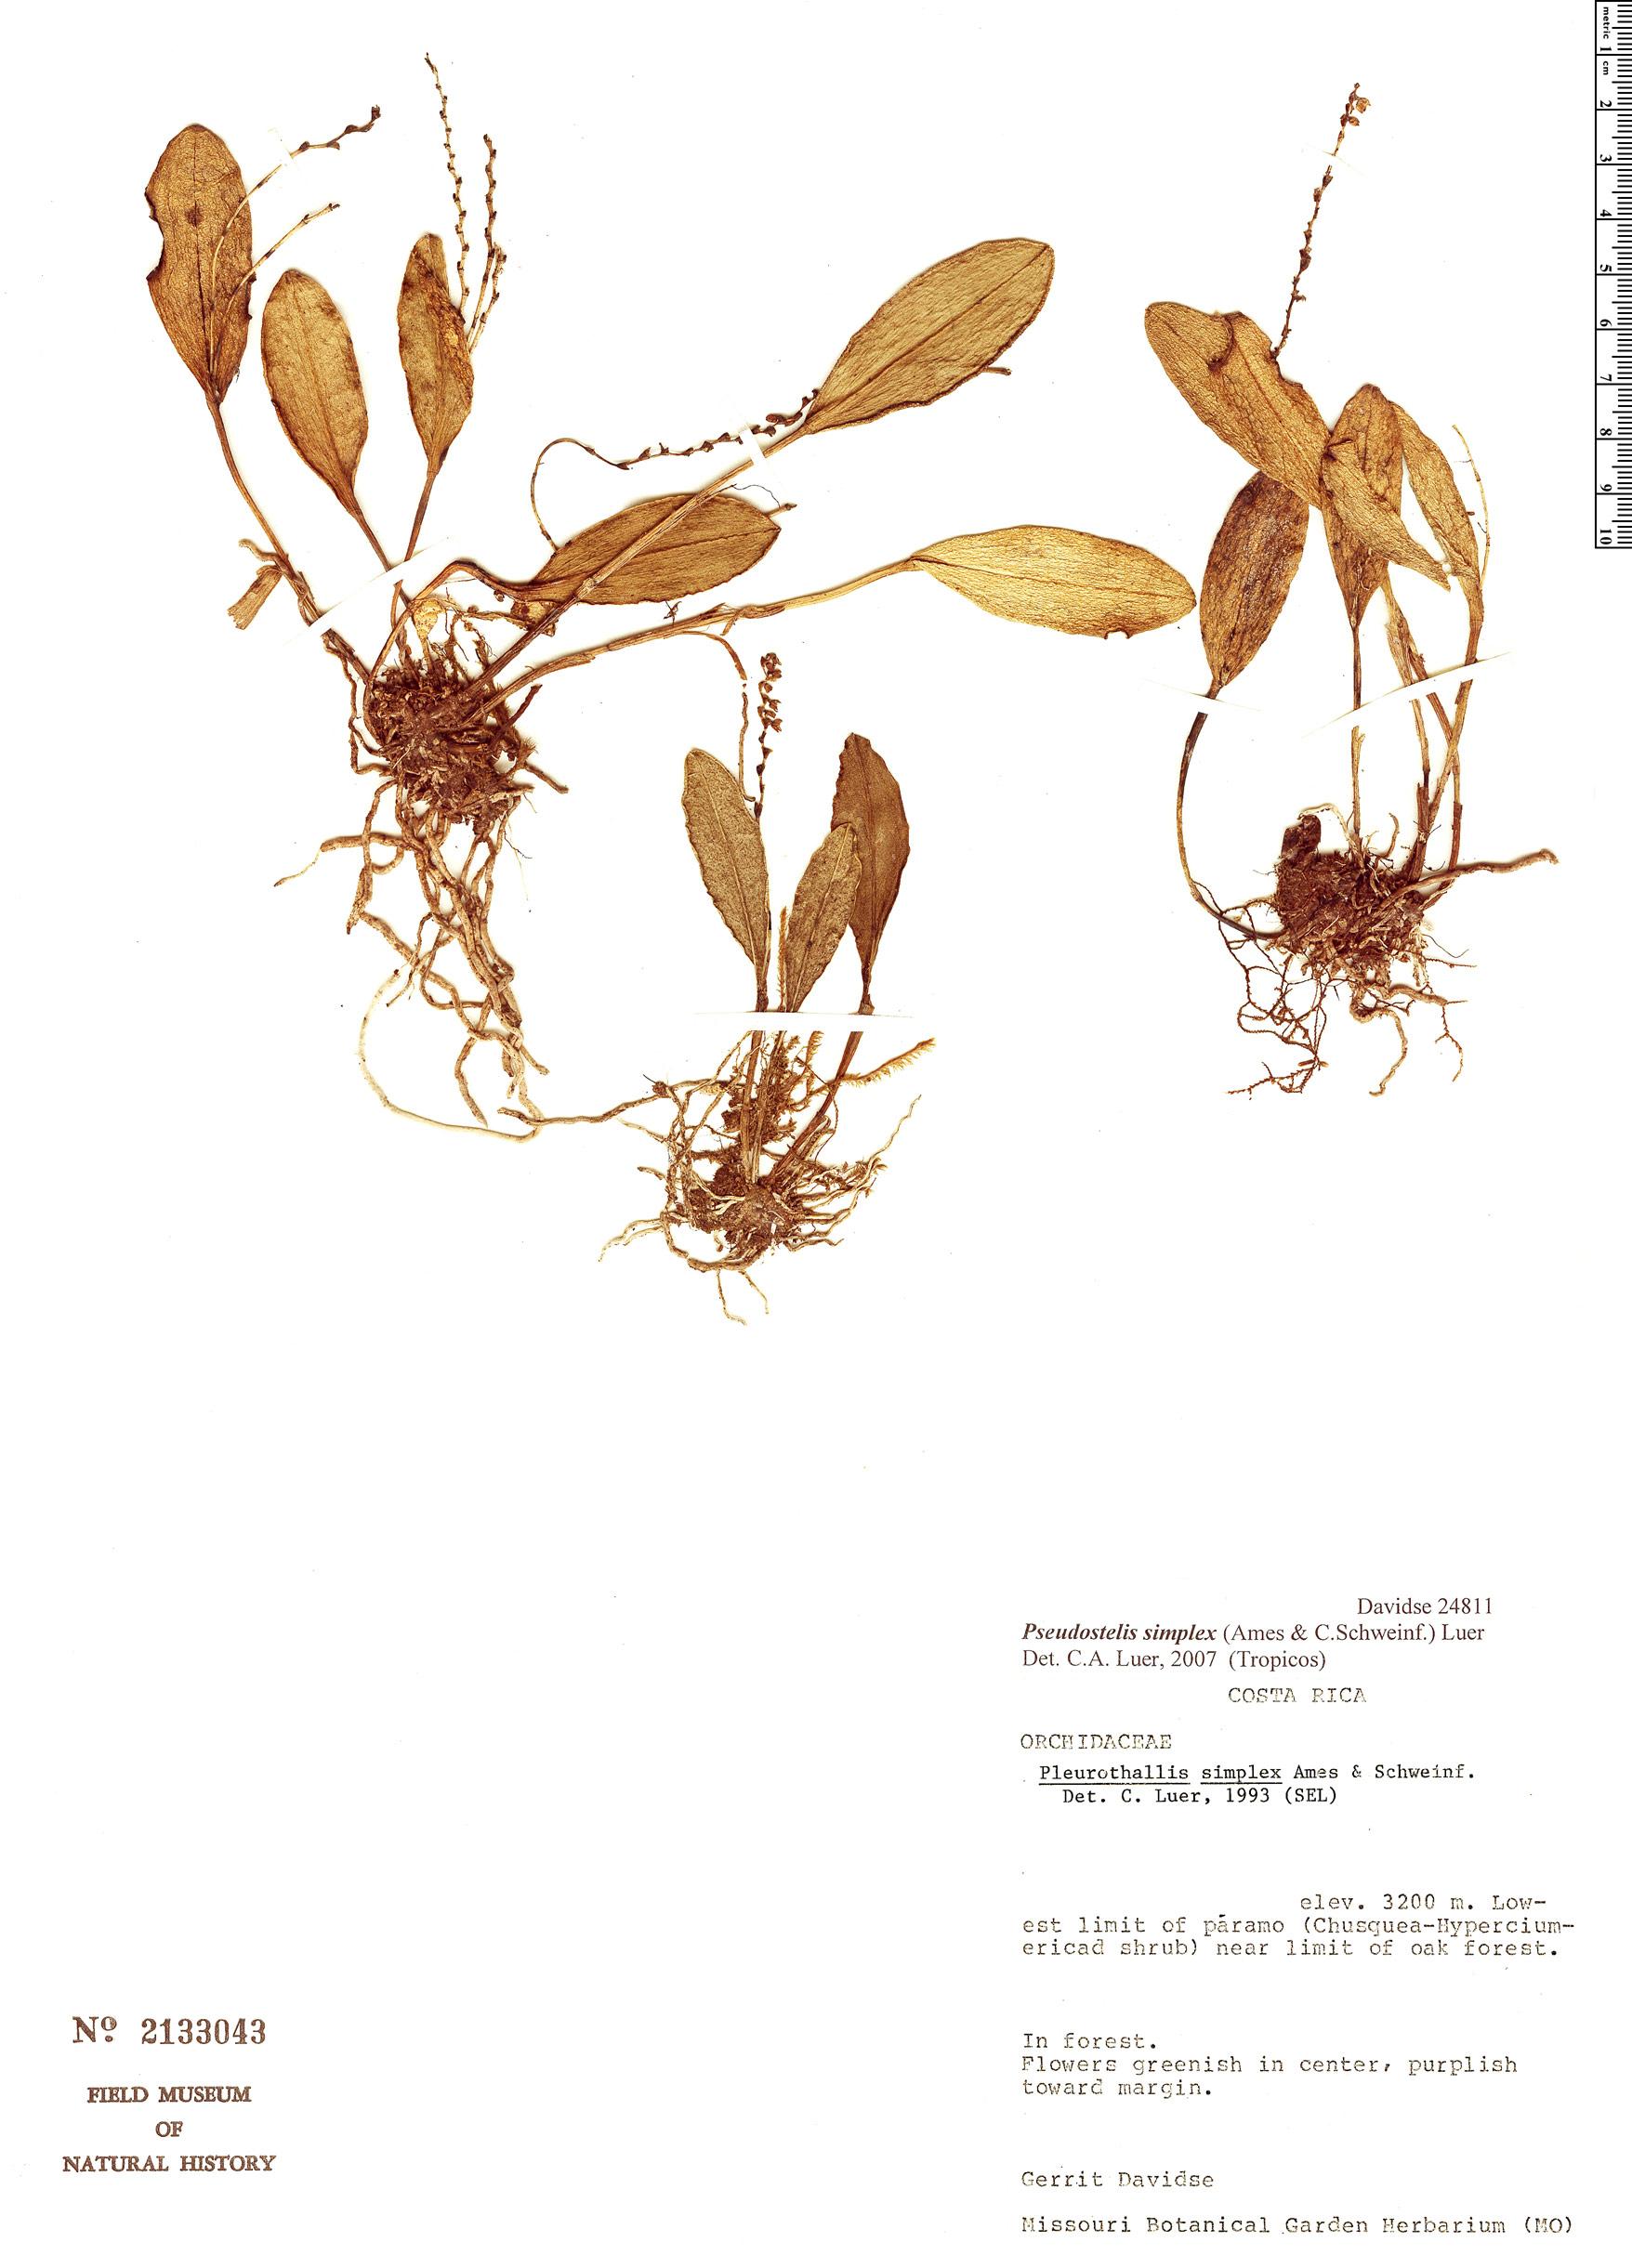 Specimen: Pleurothallis simplex